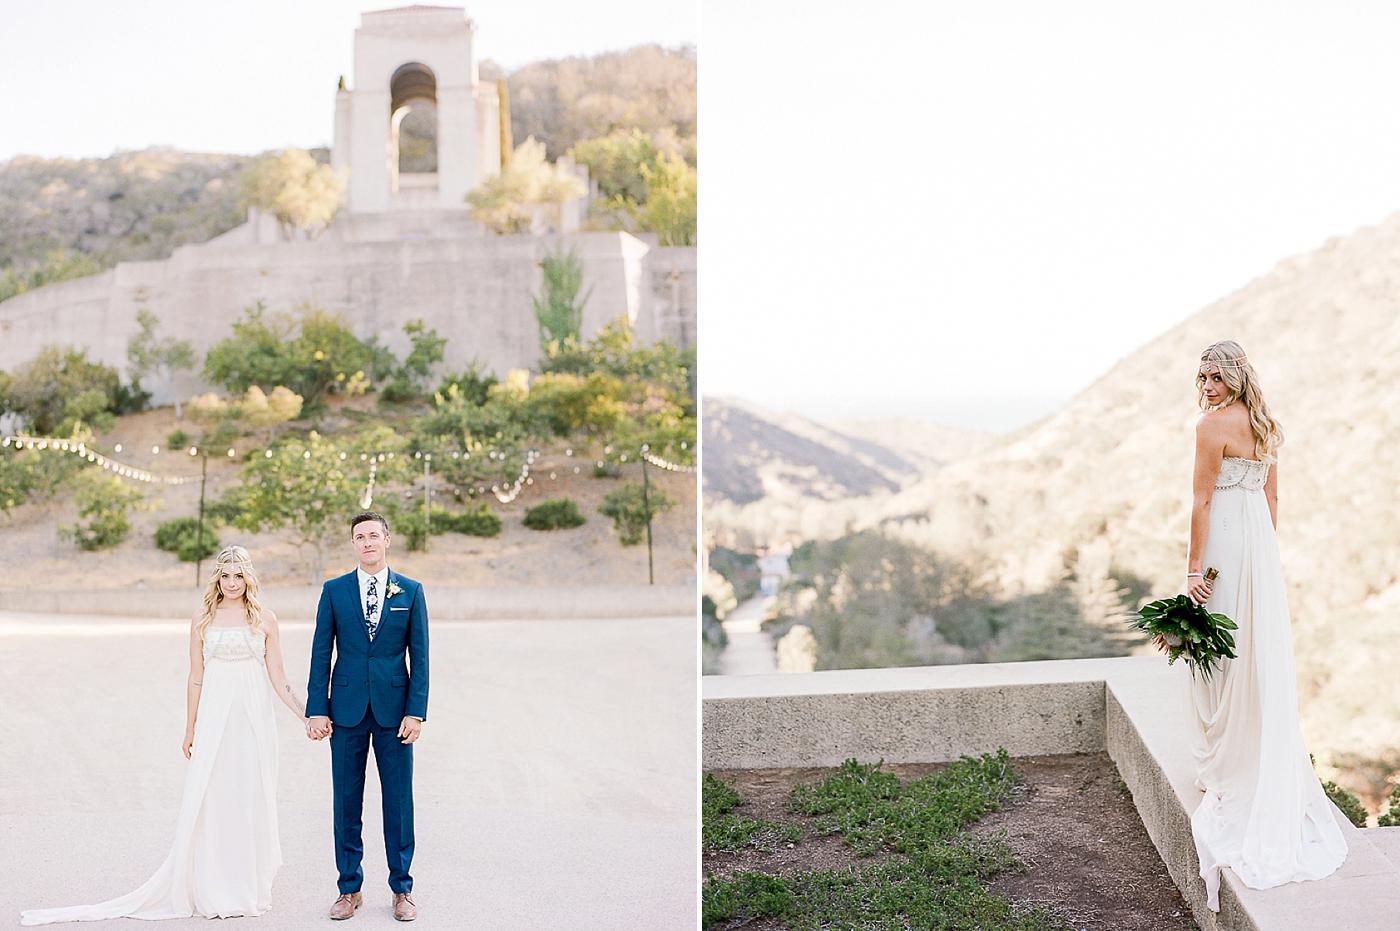 nashville-wedding-photographer-greg-ross_0195